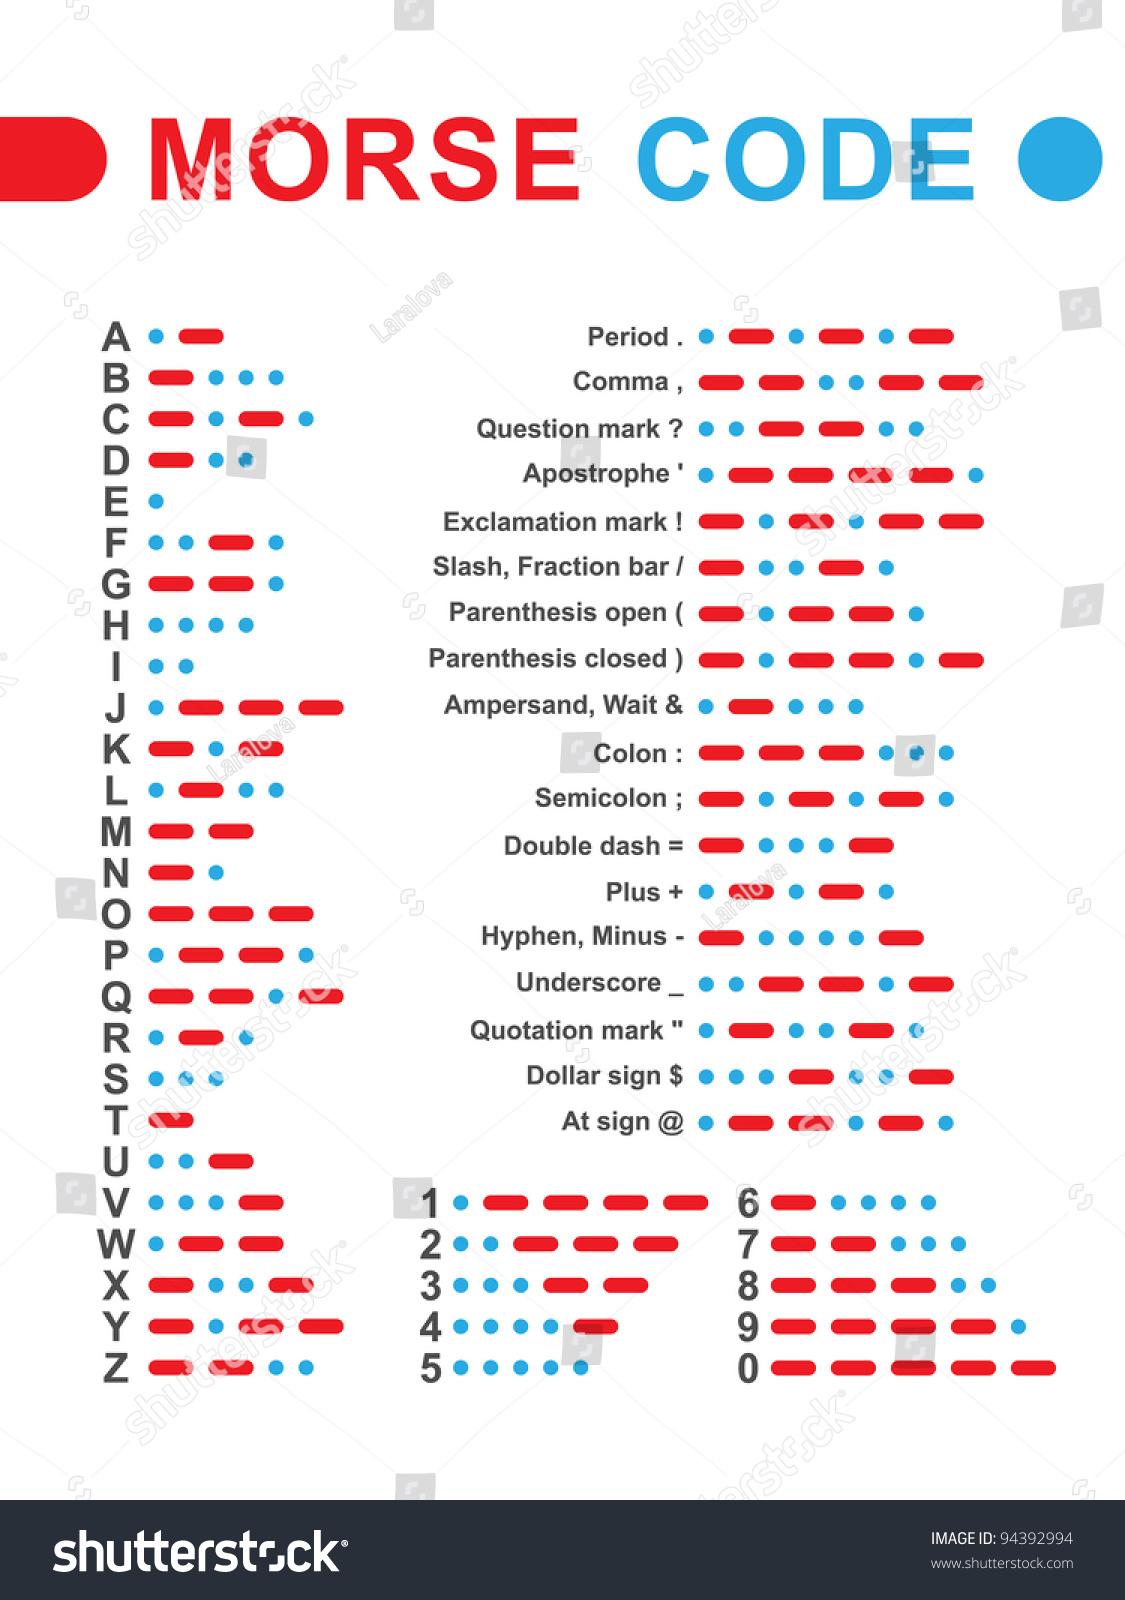 Morse Code Vector Illustration